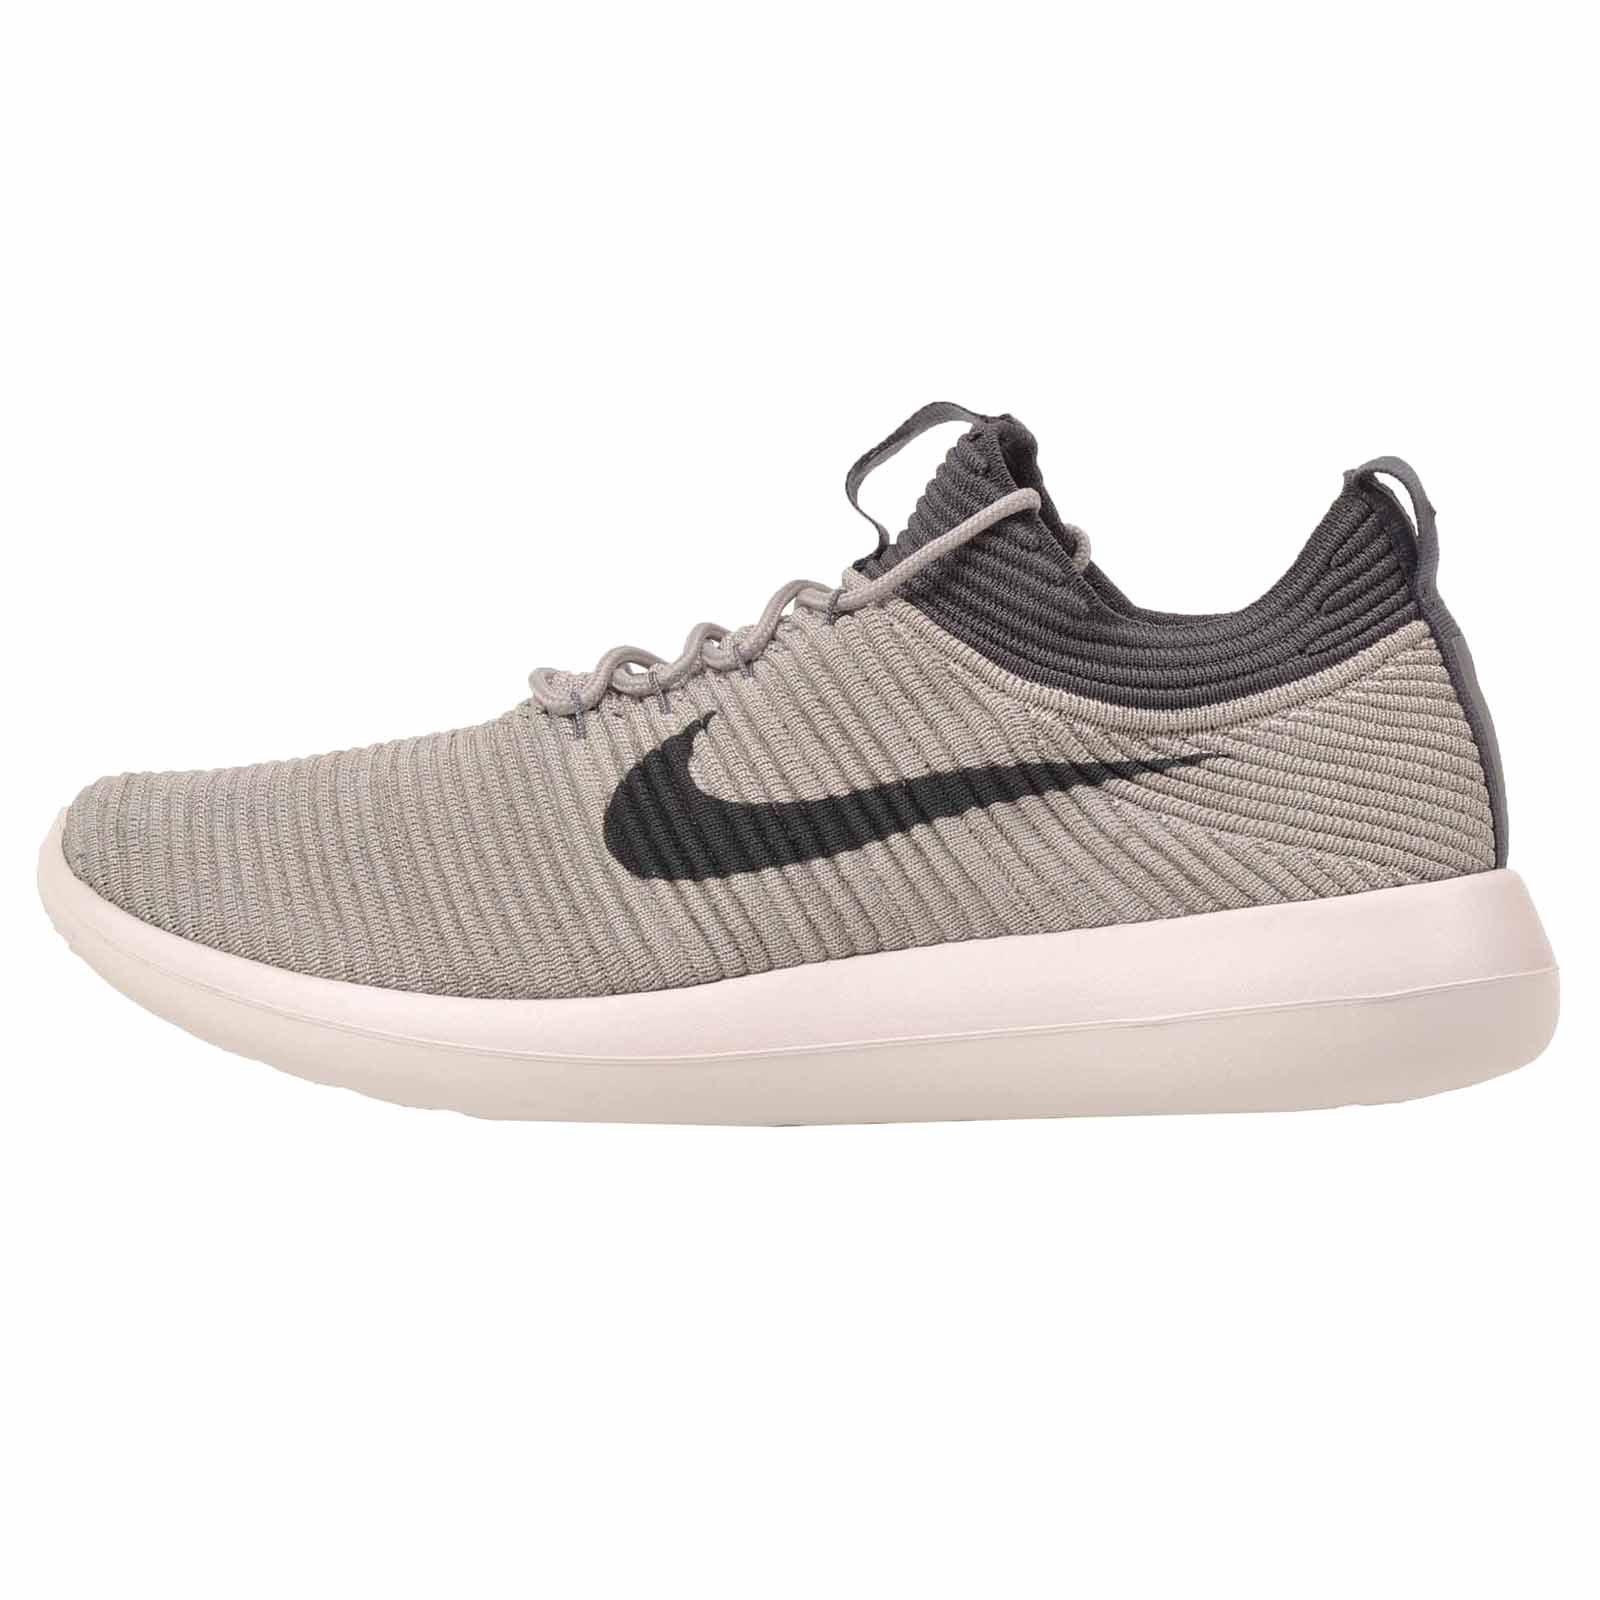 meet 5e851 cda44 Nike Roshe Two Flyknit V2 Pale Grey Women's Running Training Shoes Size 10